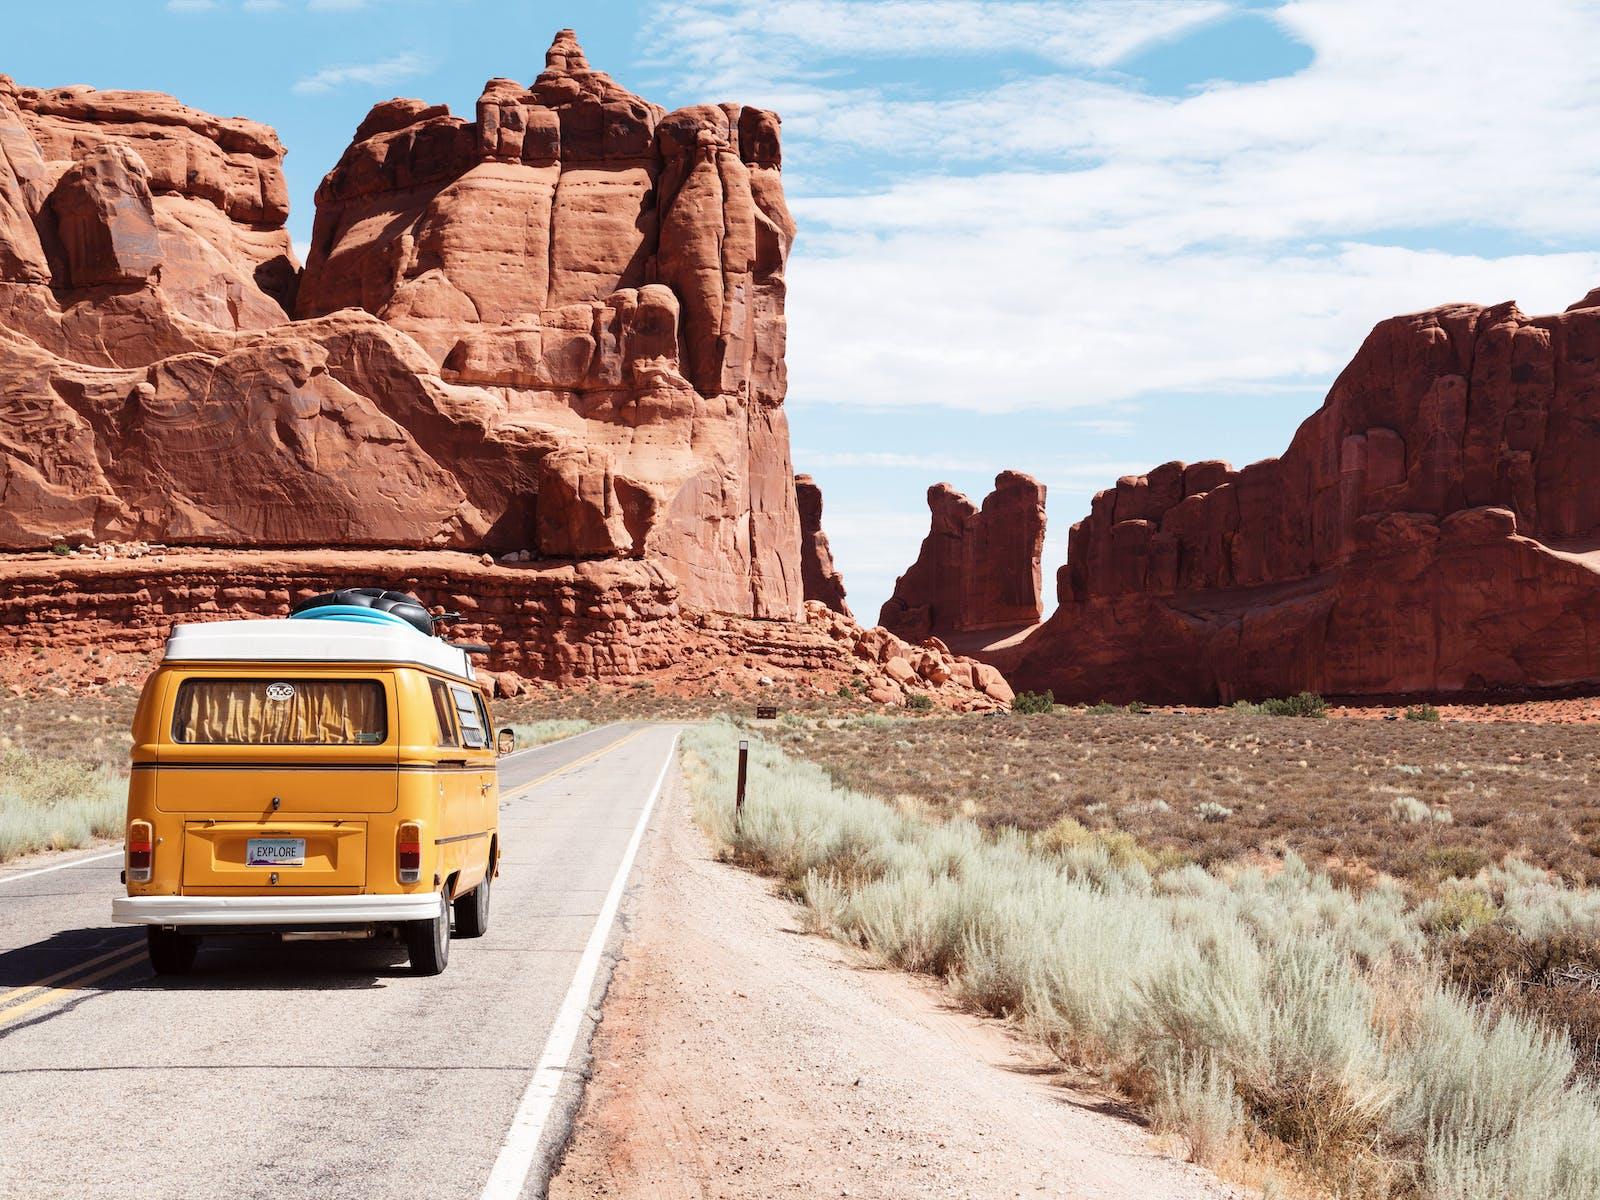 Van road trip through the southwest